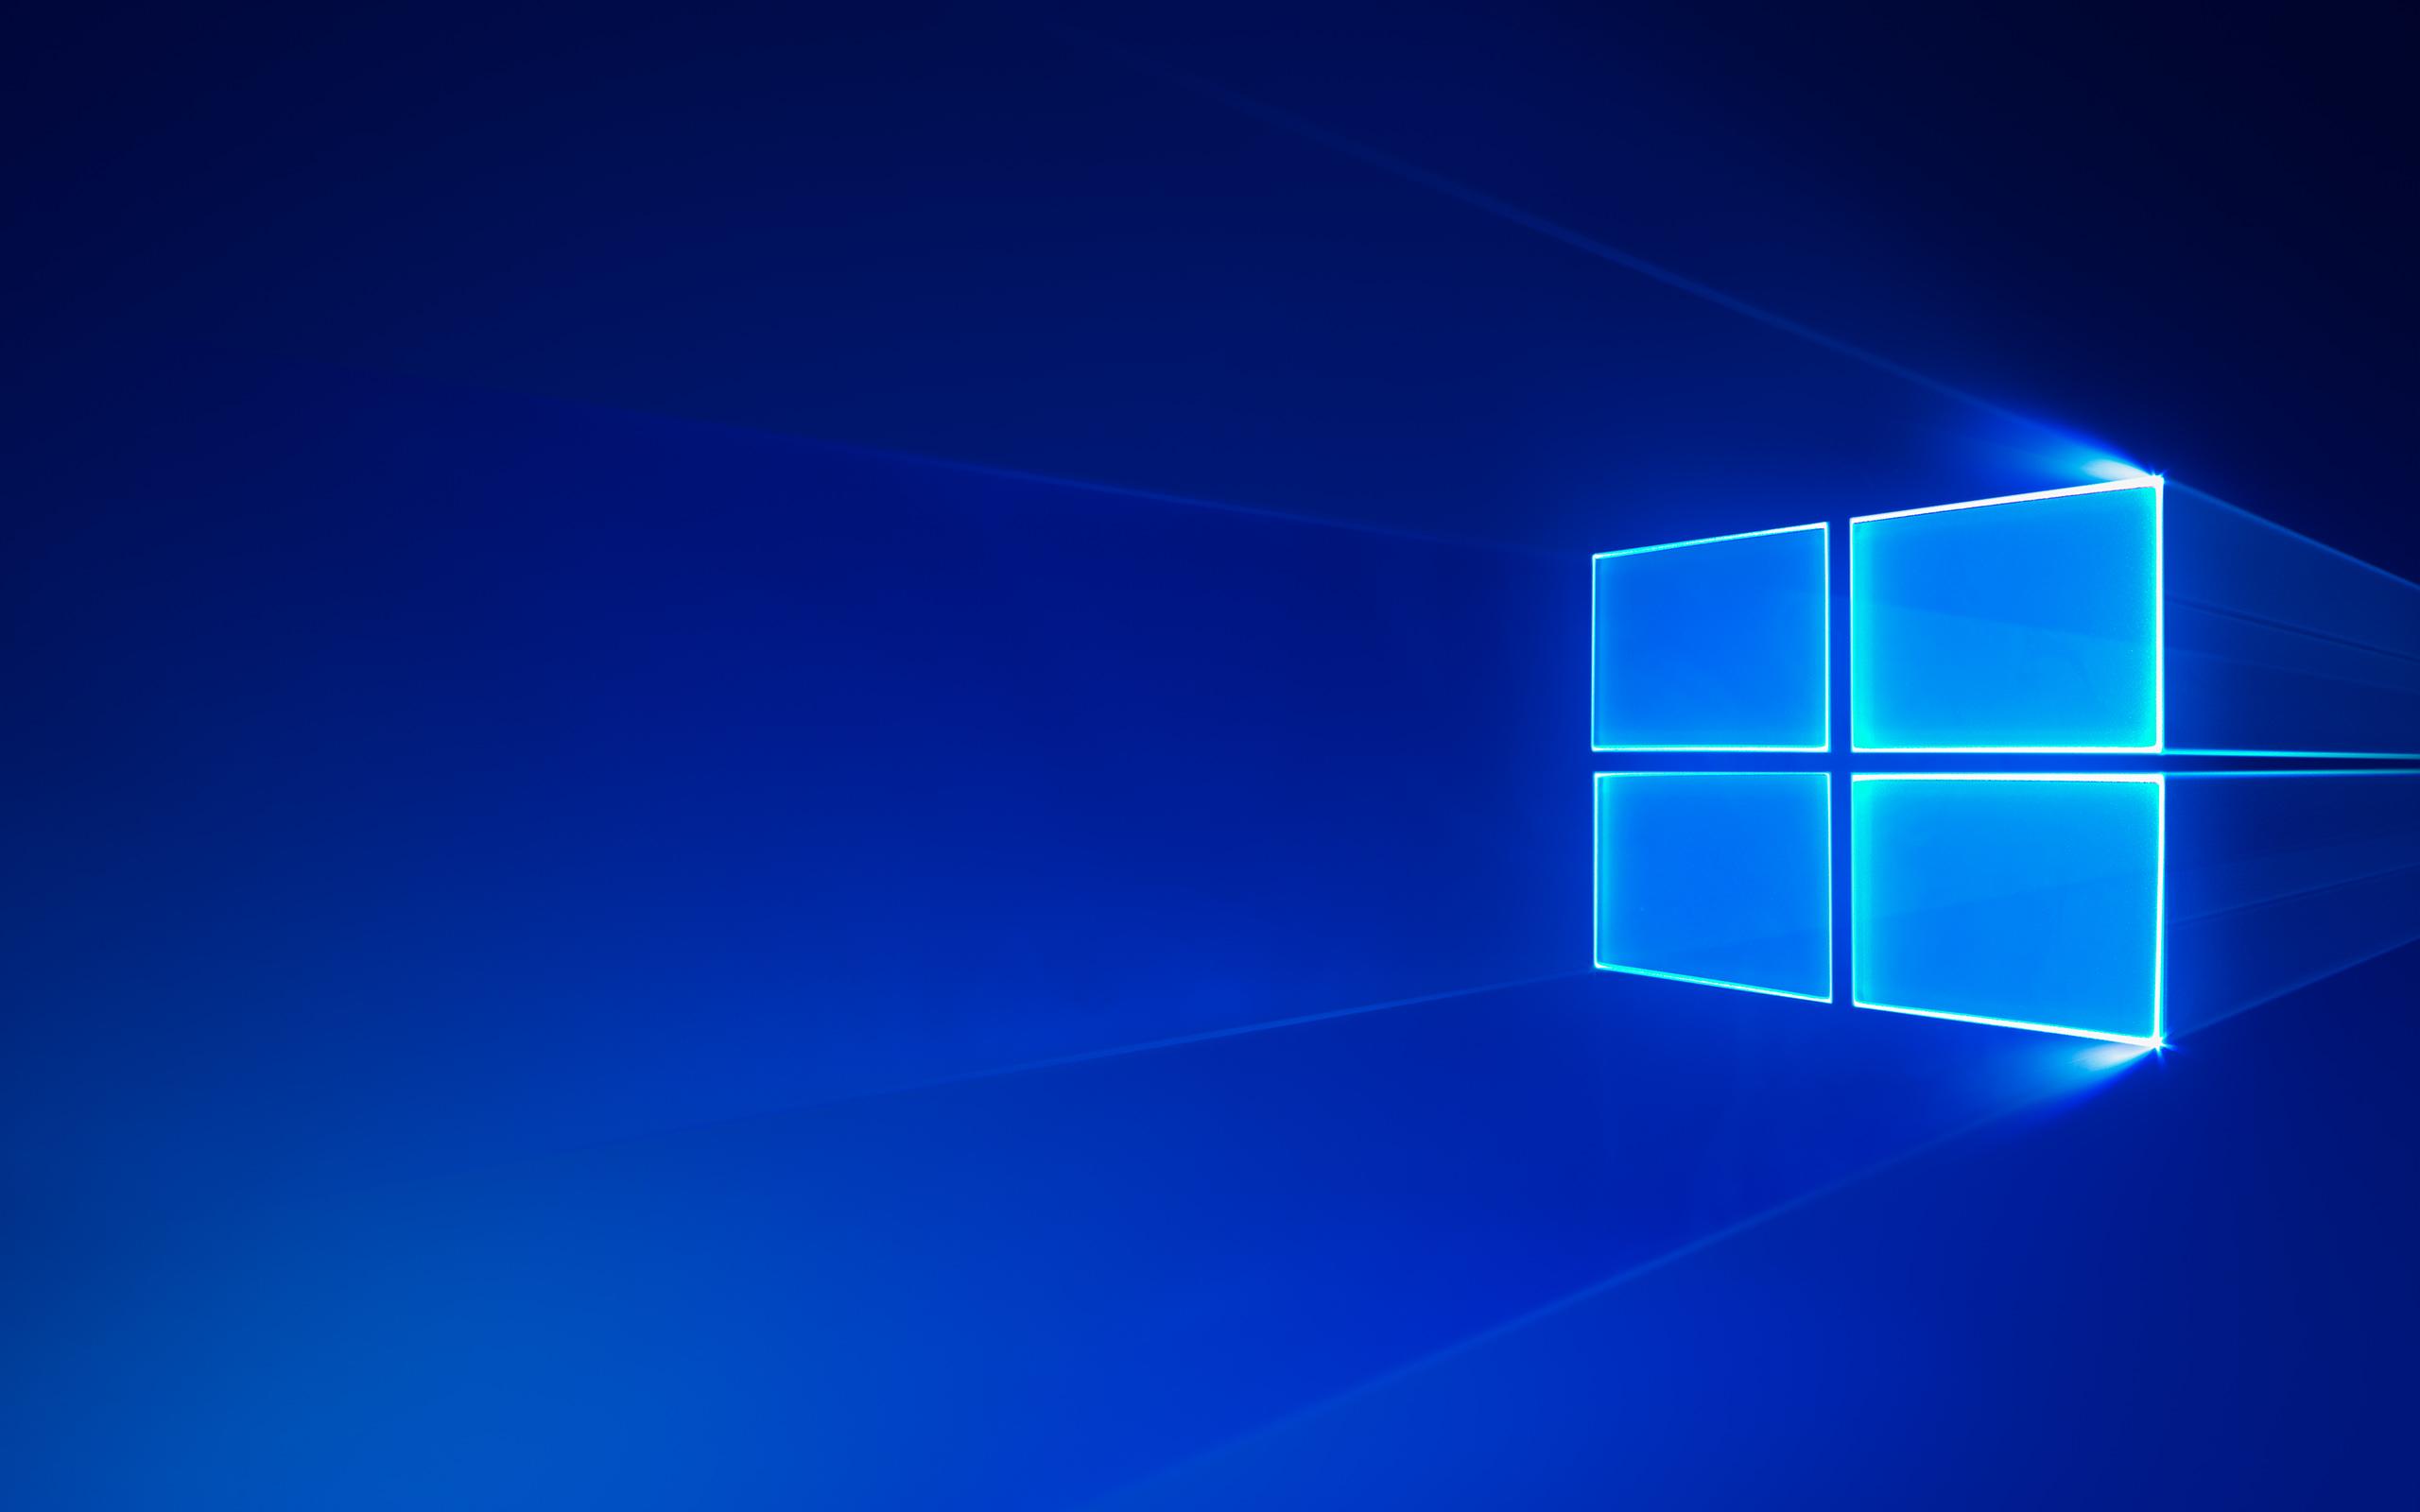 microsoft windows 10 education free